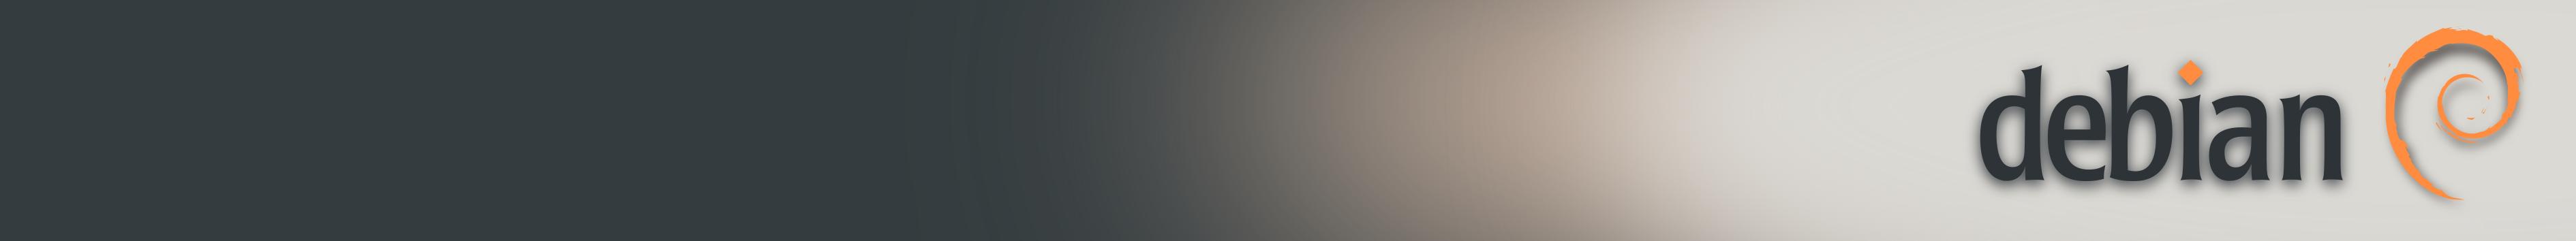 png/800x75-banner-installer-1.png